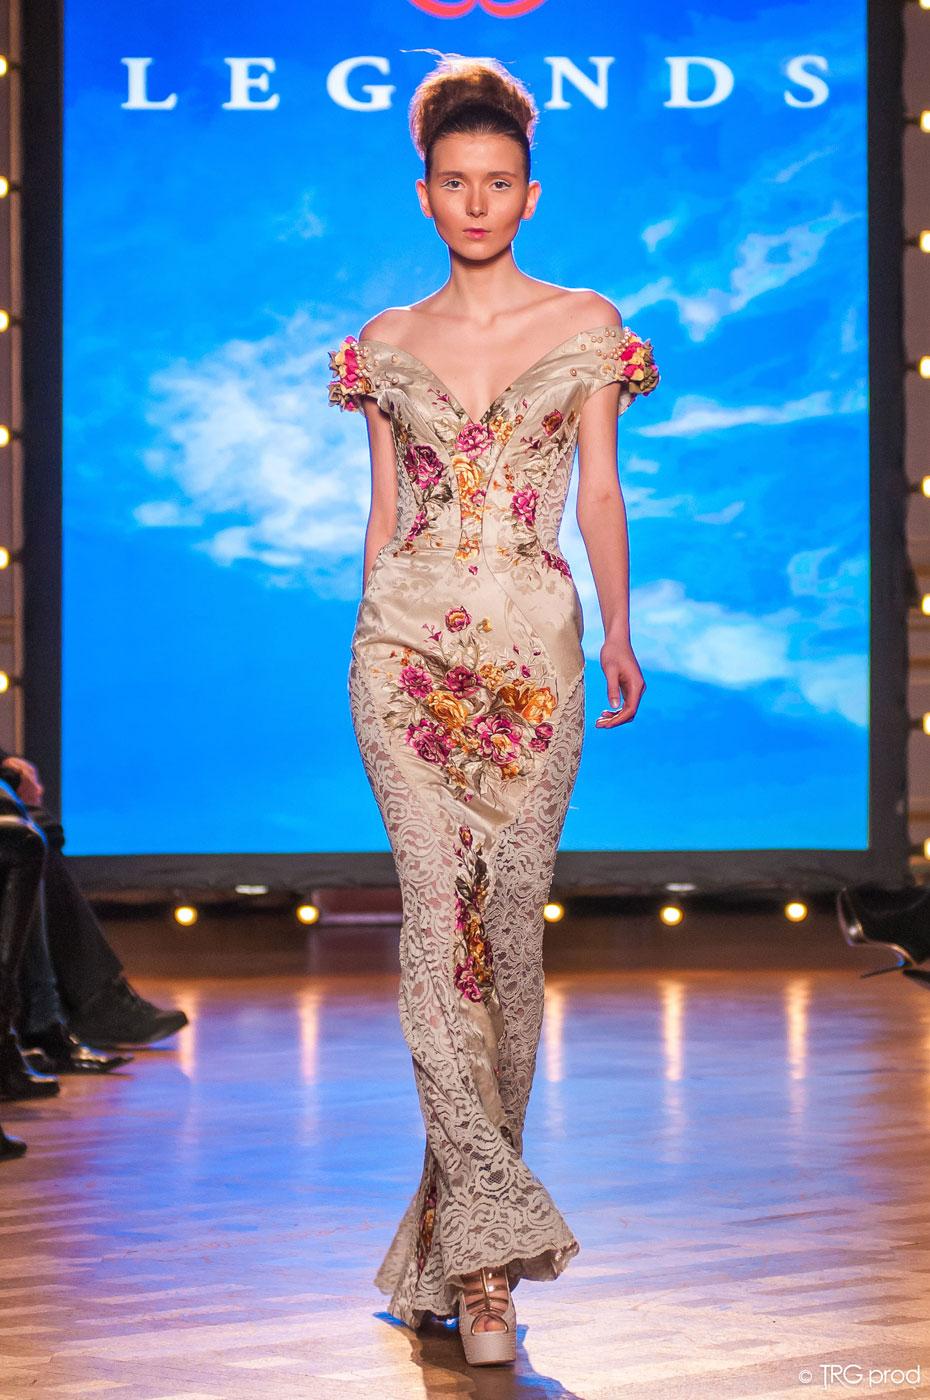 Legends-fashion-runway-show-haute-couture-paris-spring-2015-the-impression-15